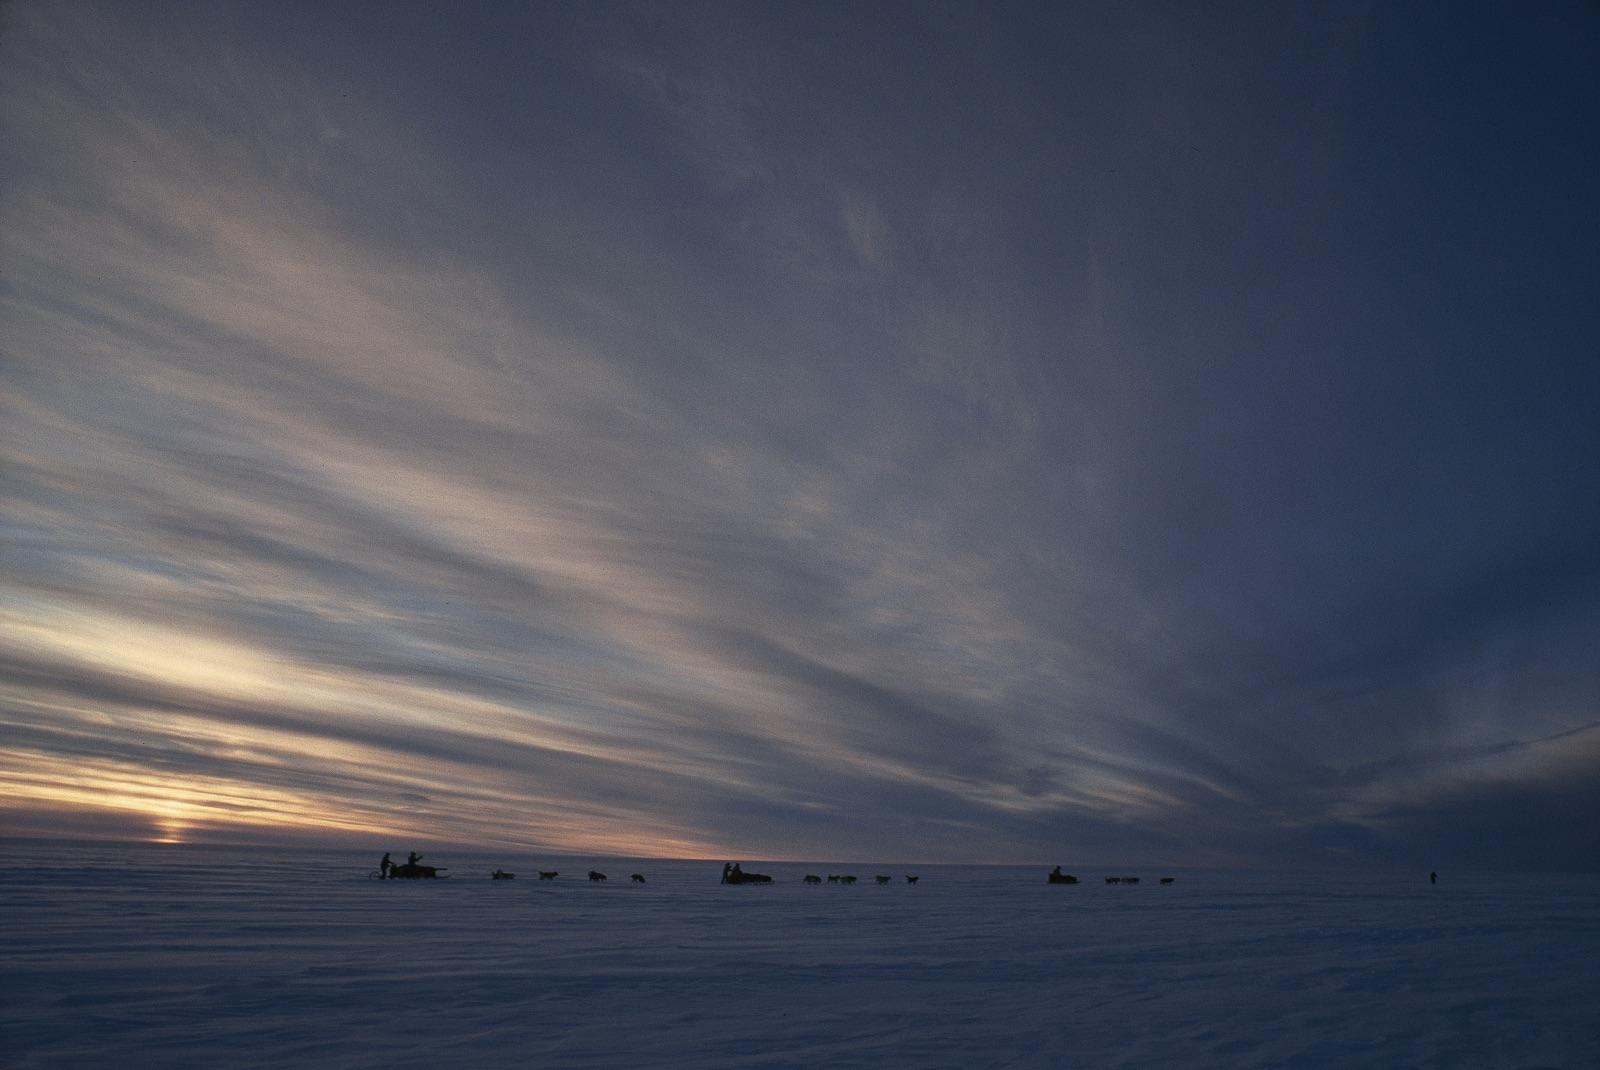 Late winter days in Antarctica. Photo ©Trans-Antarctica-Per Breiehagen